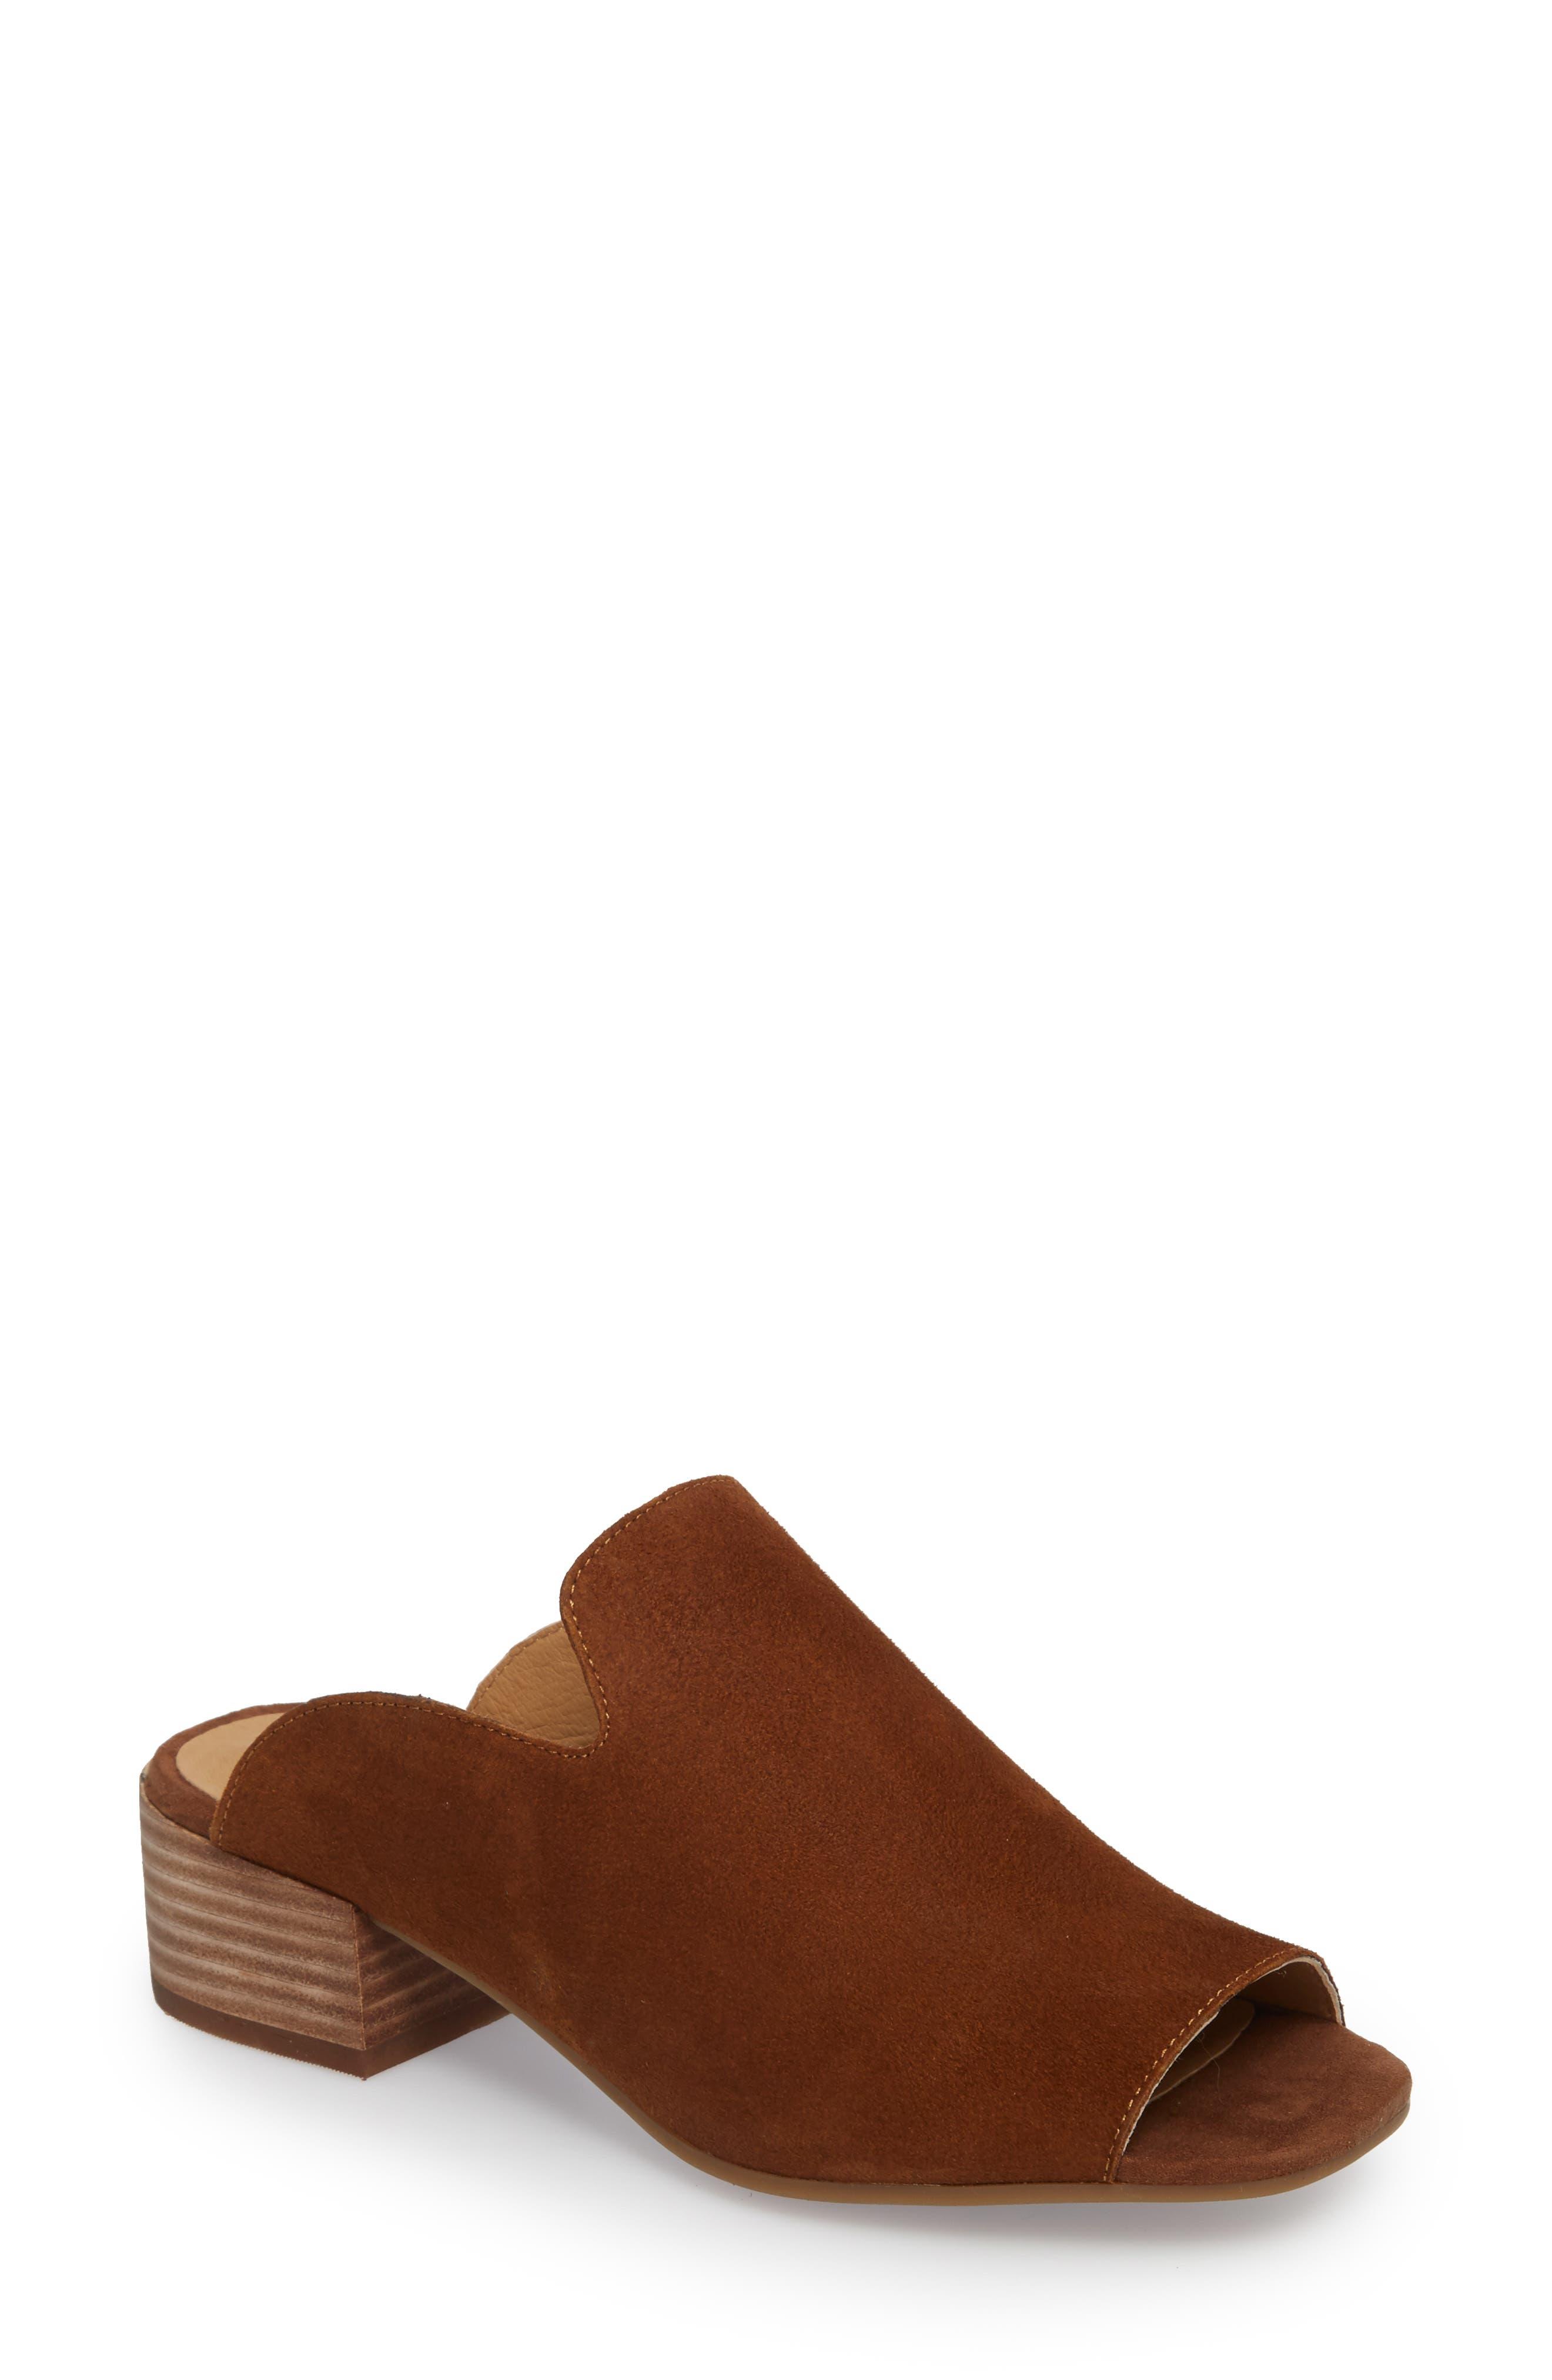 Noomrie Sandal,                             Main thumbnail 1, color,                             Cedar Leather